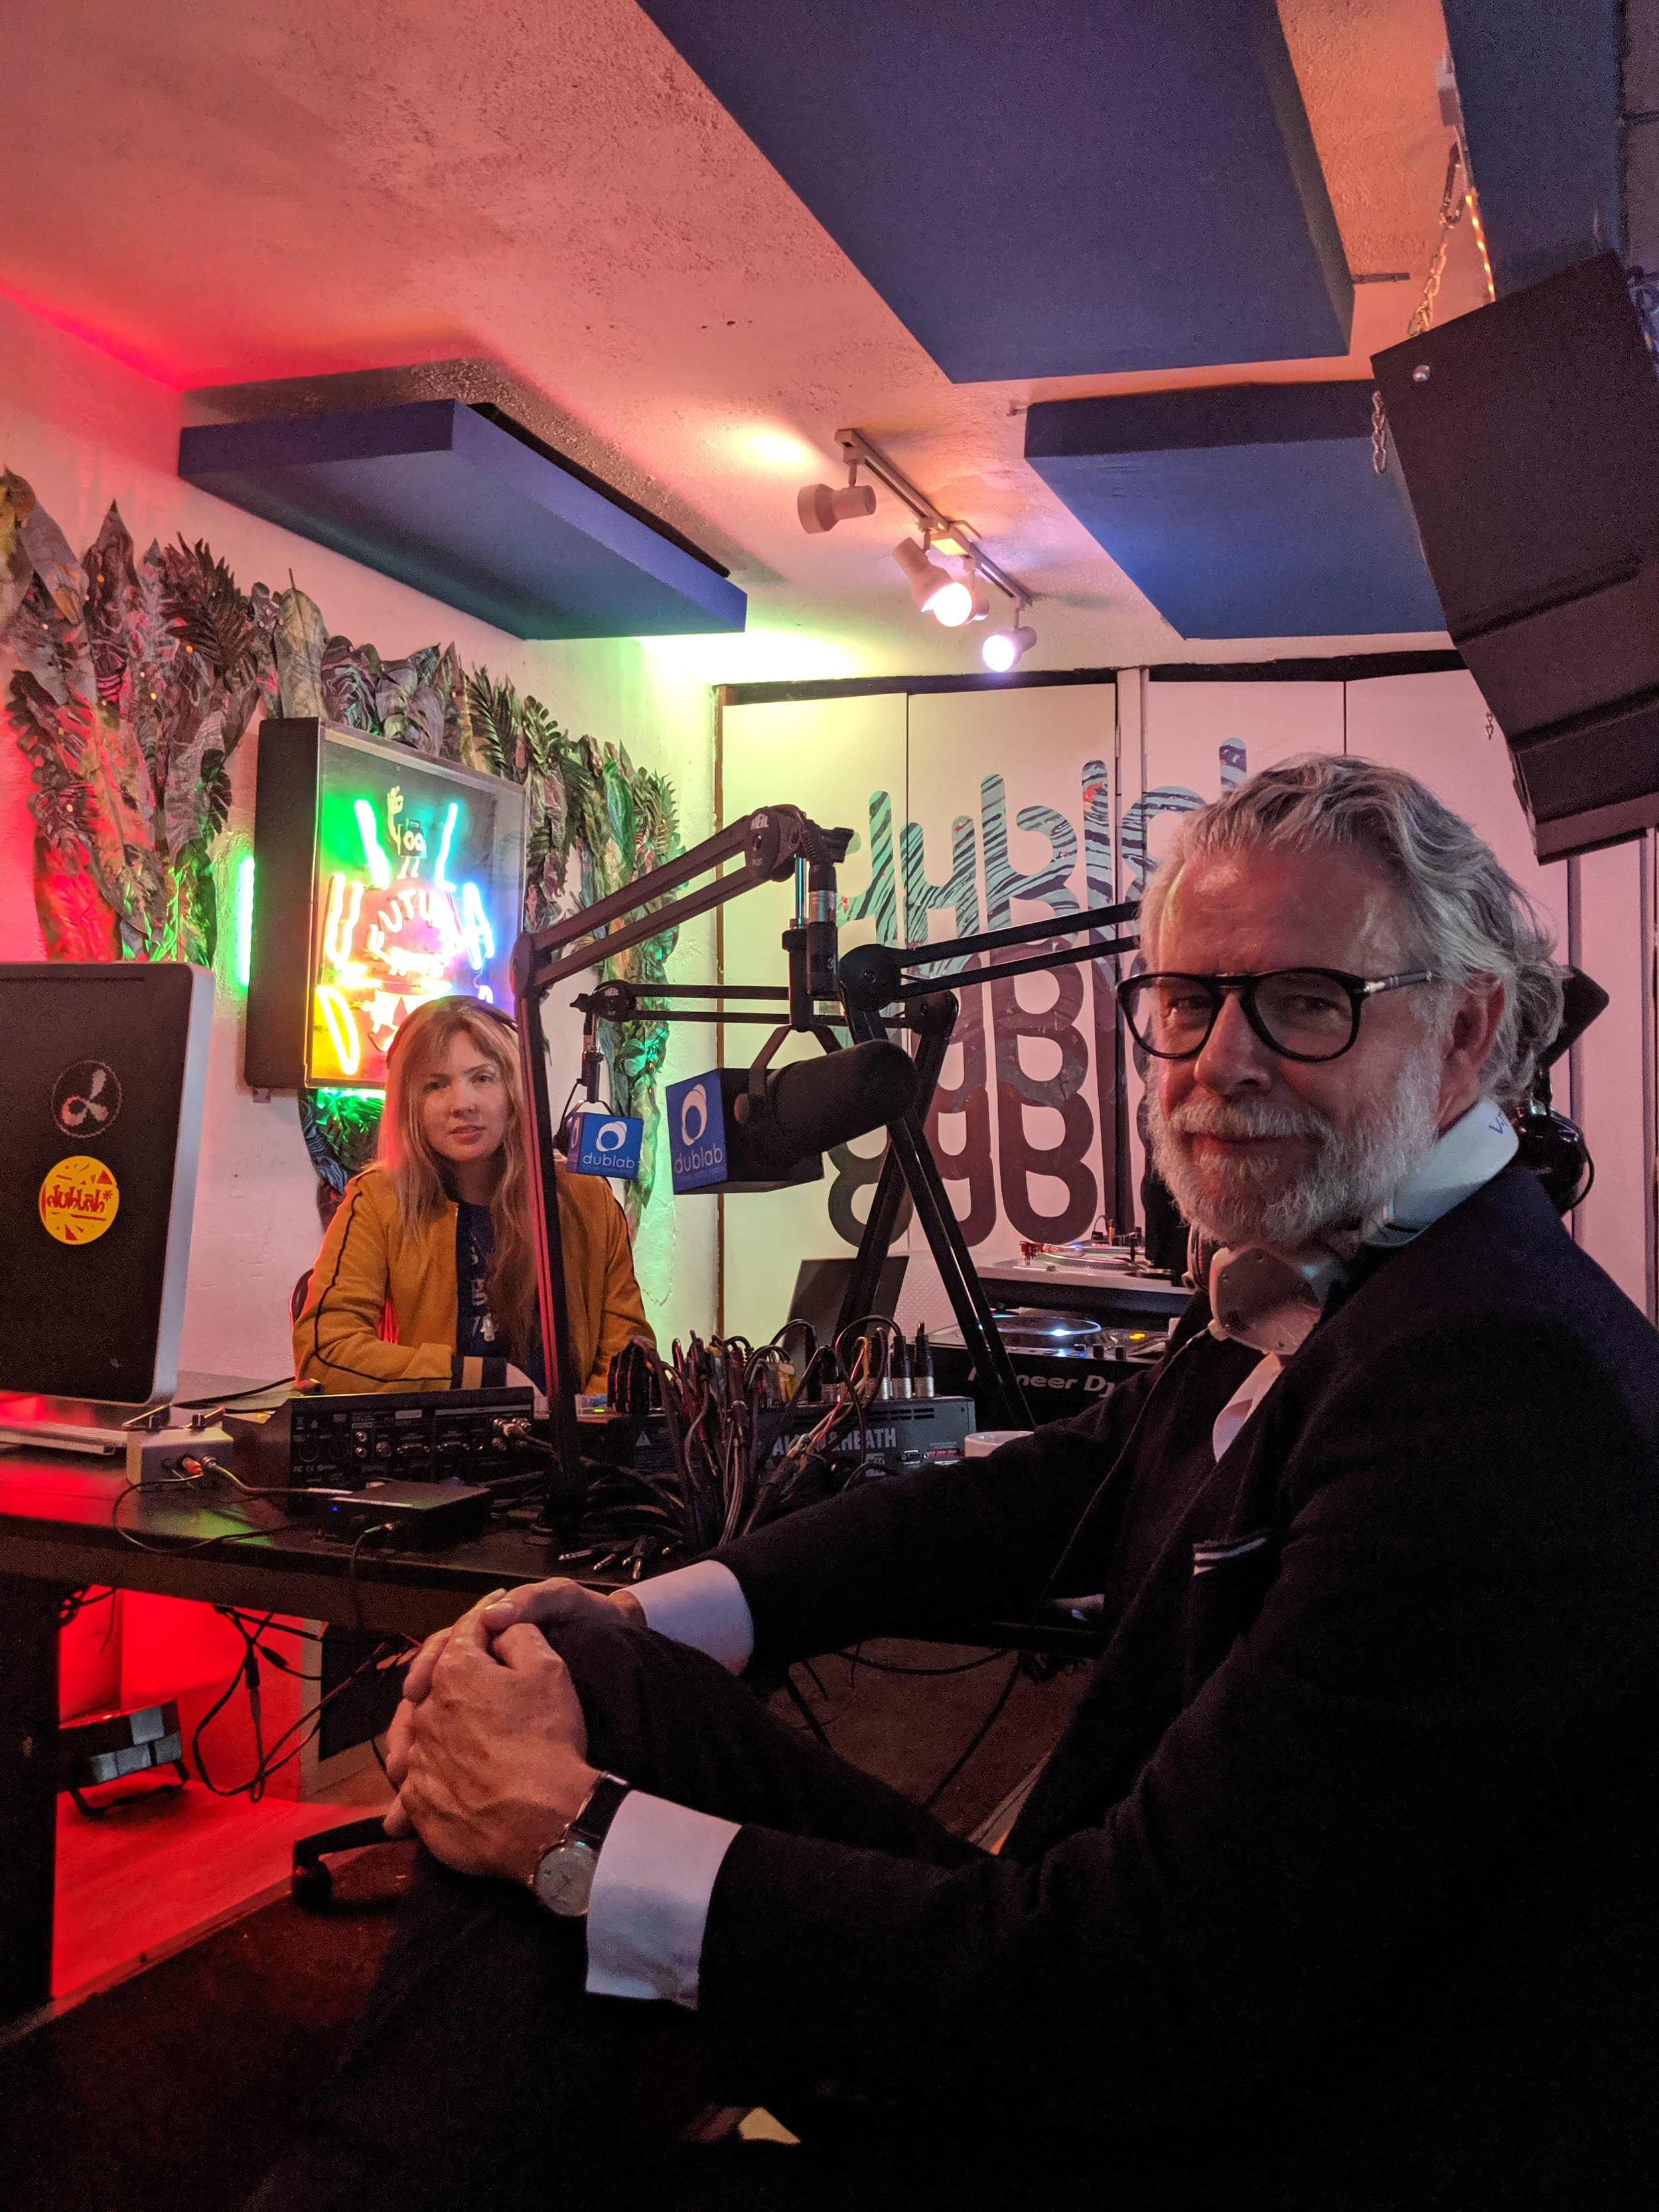 Beatie Wolfe and David Mason on LA's dublab Radio